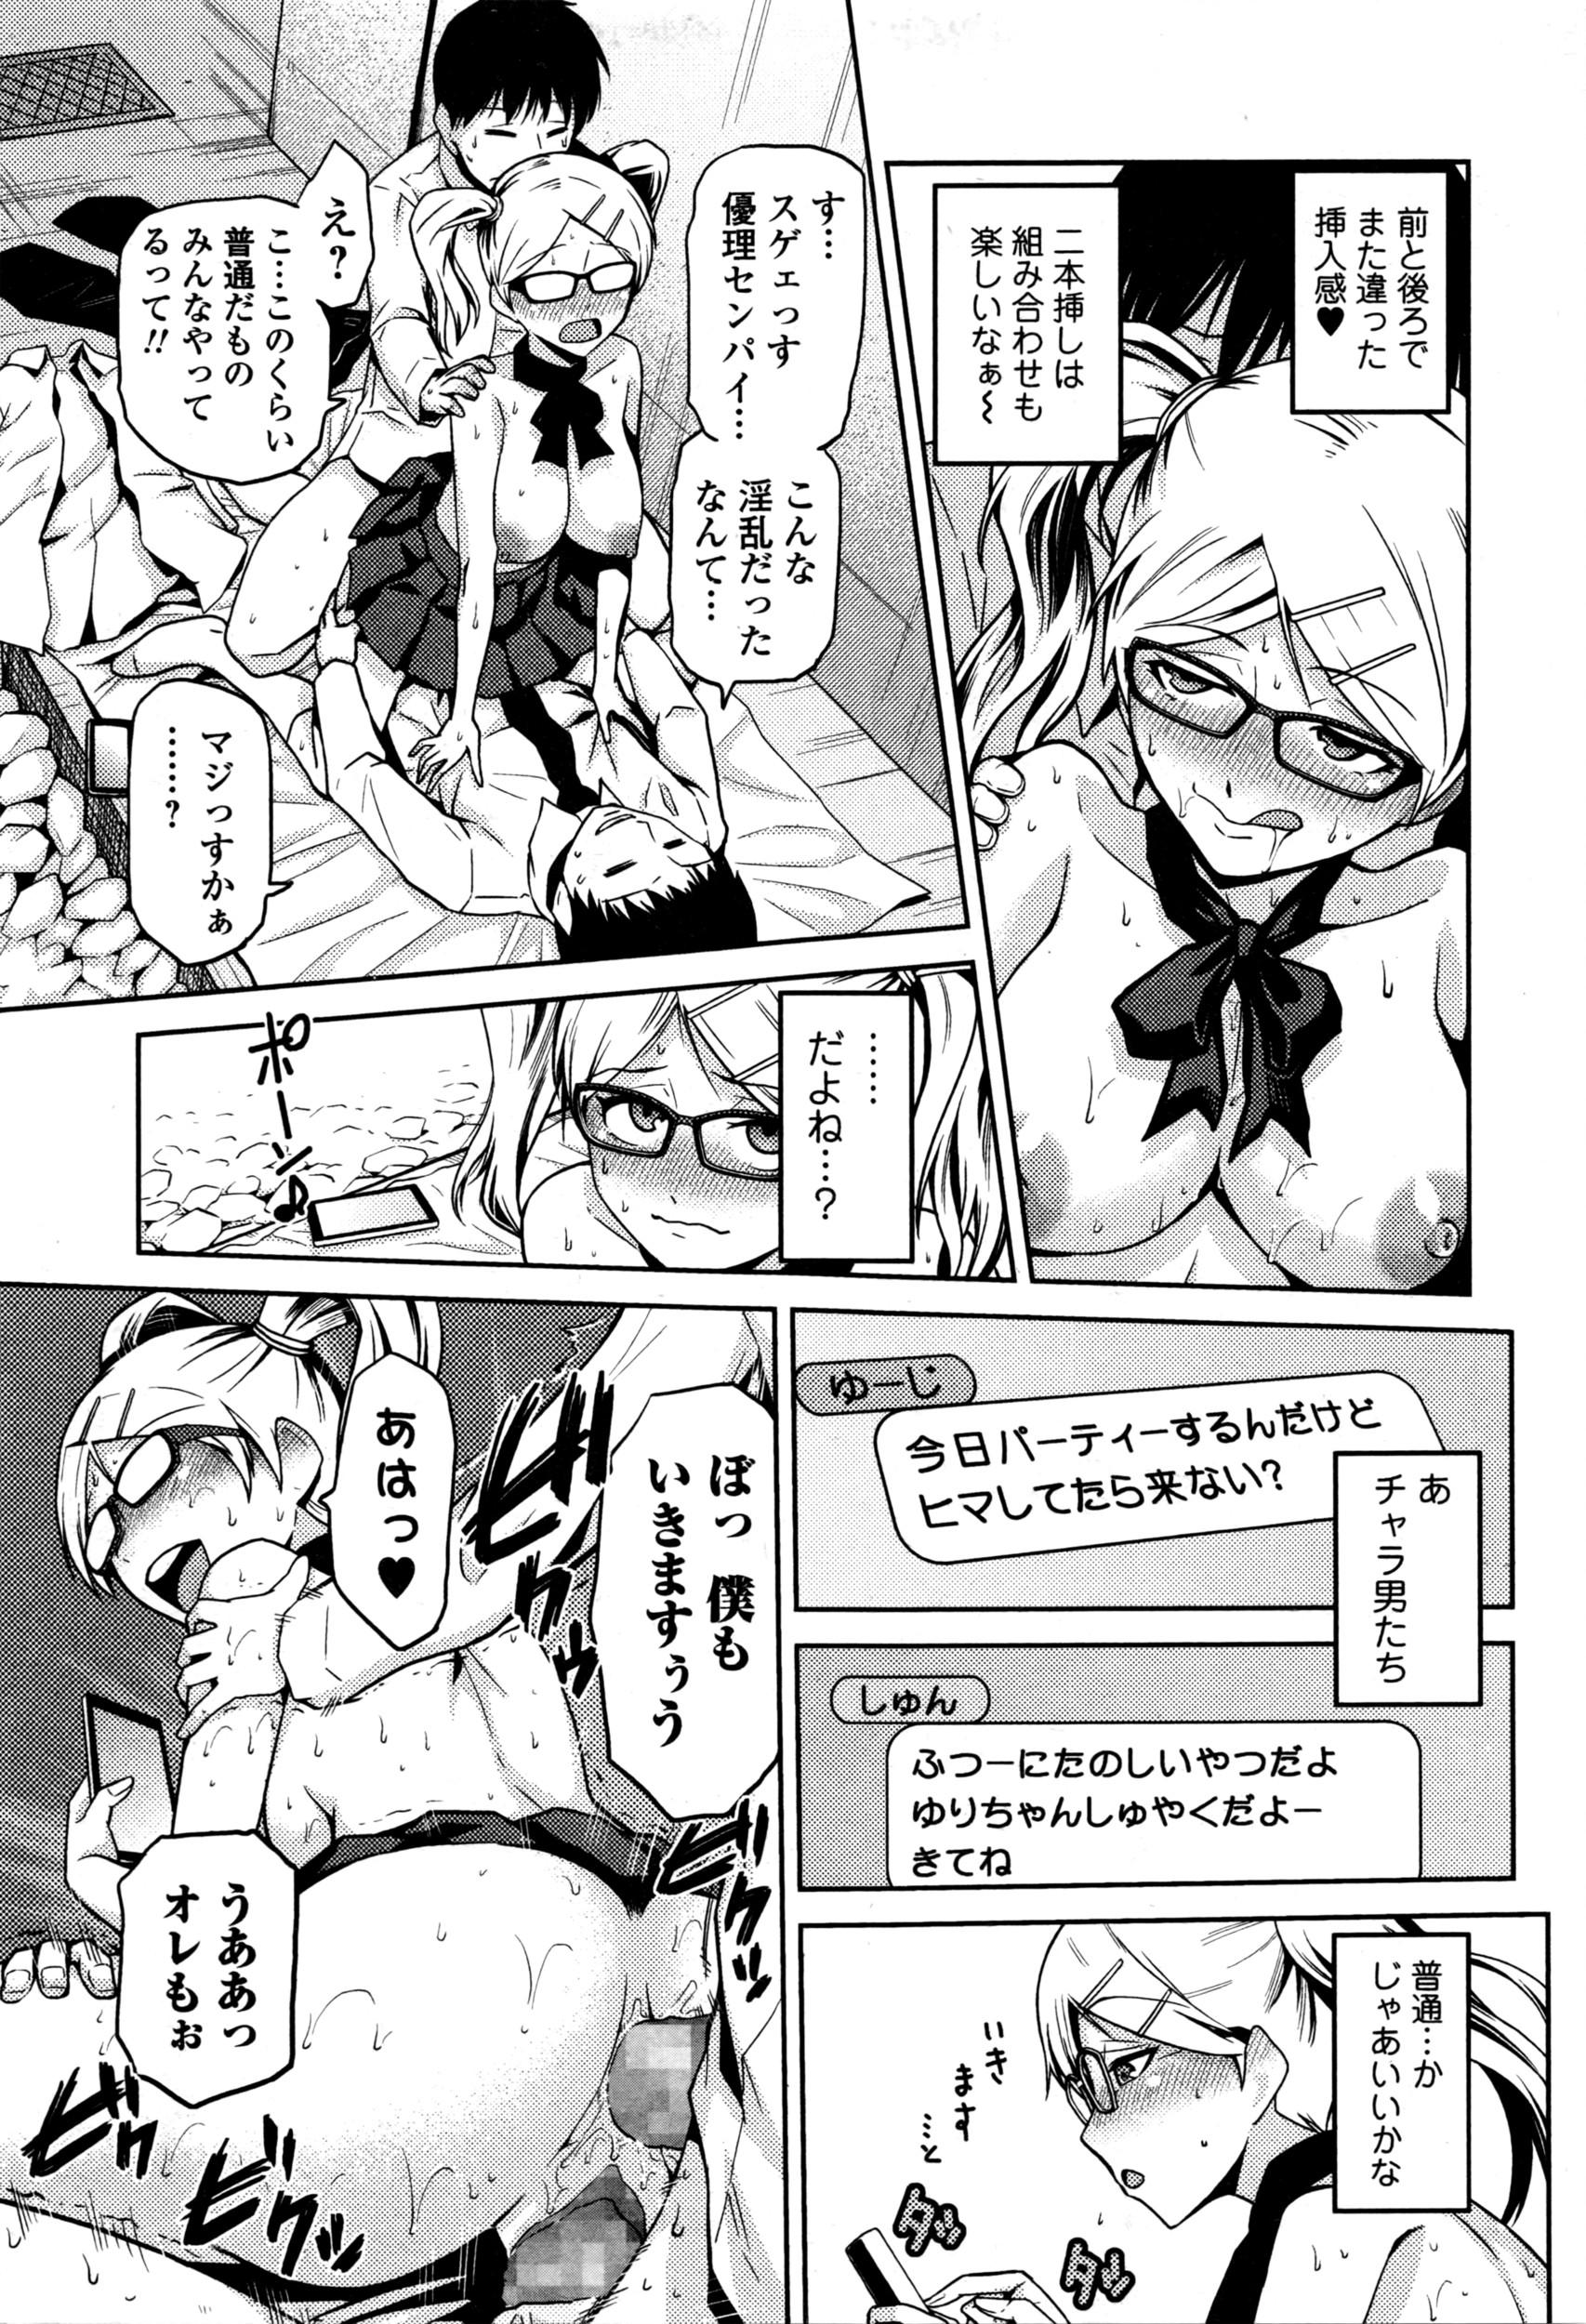 Comic JSCK Vol.3 2016-03 149